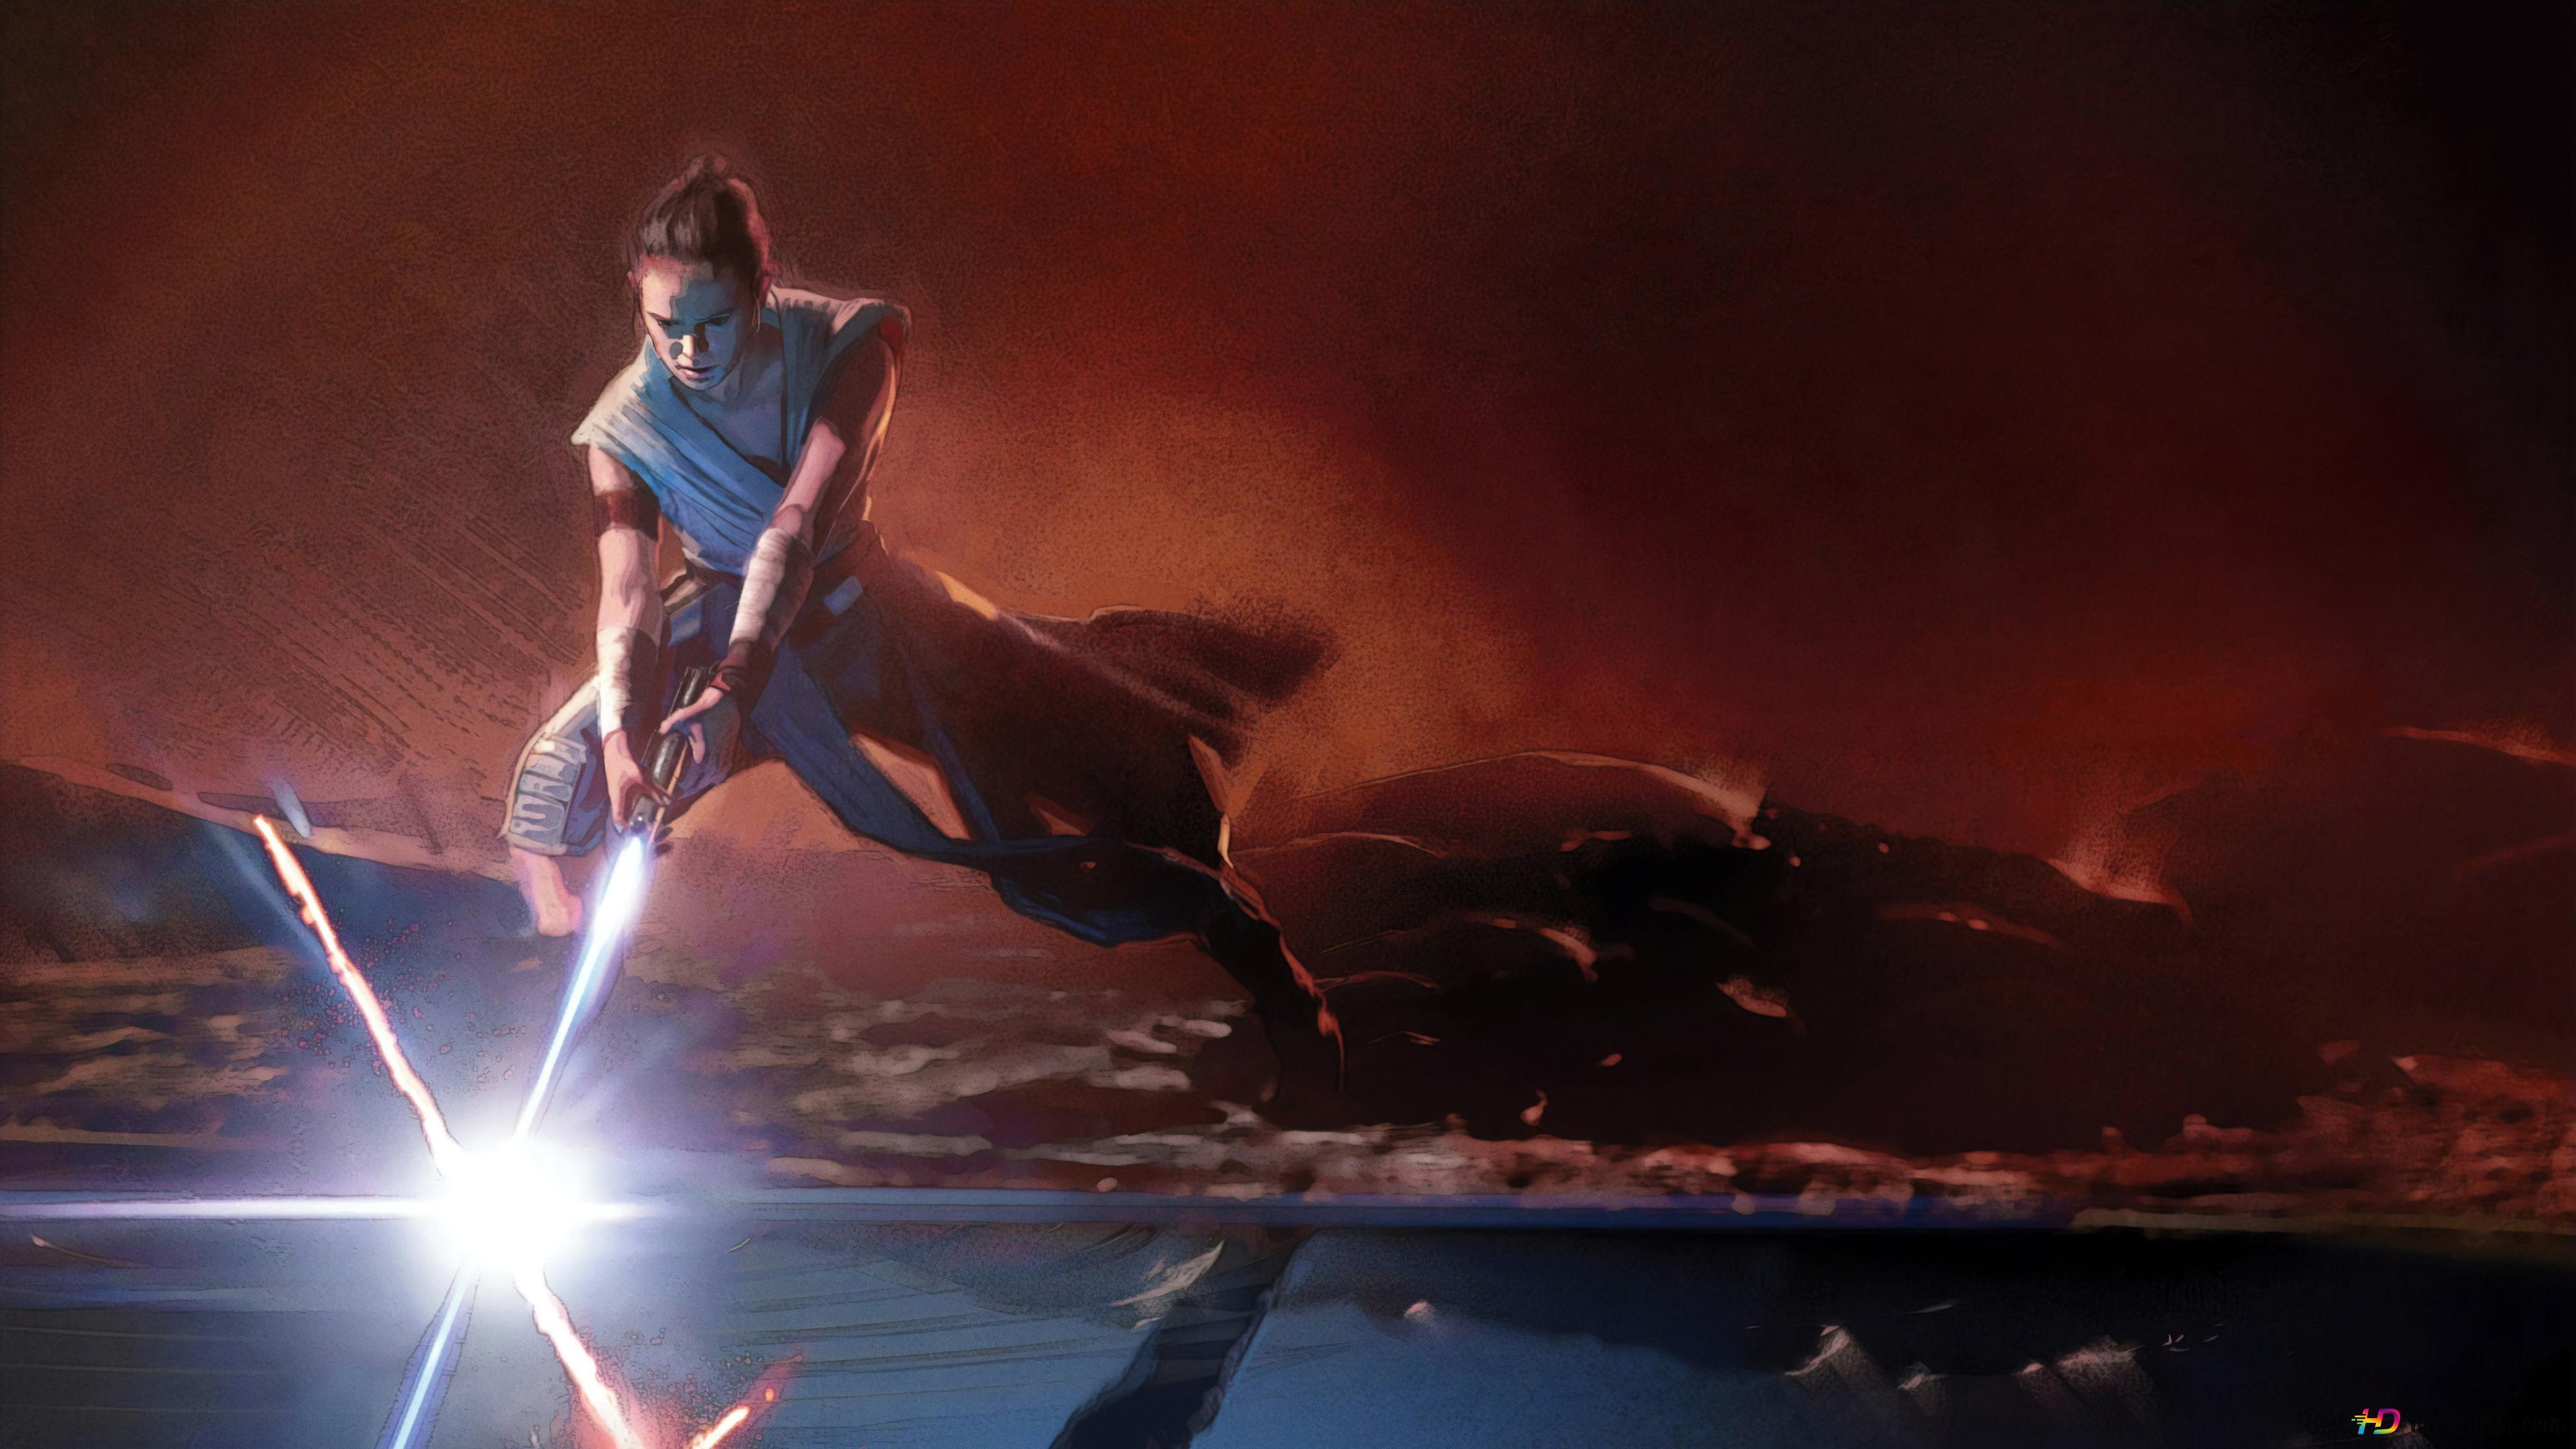 Star Wars The Rise Of Skywalker Hd Wallpaper Download